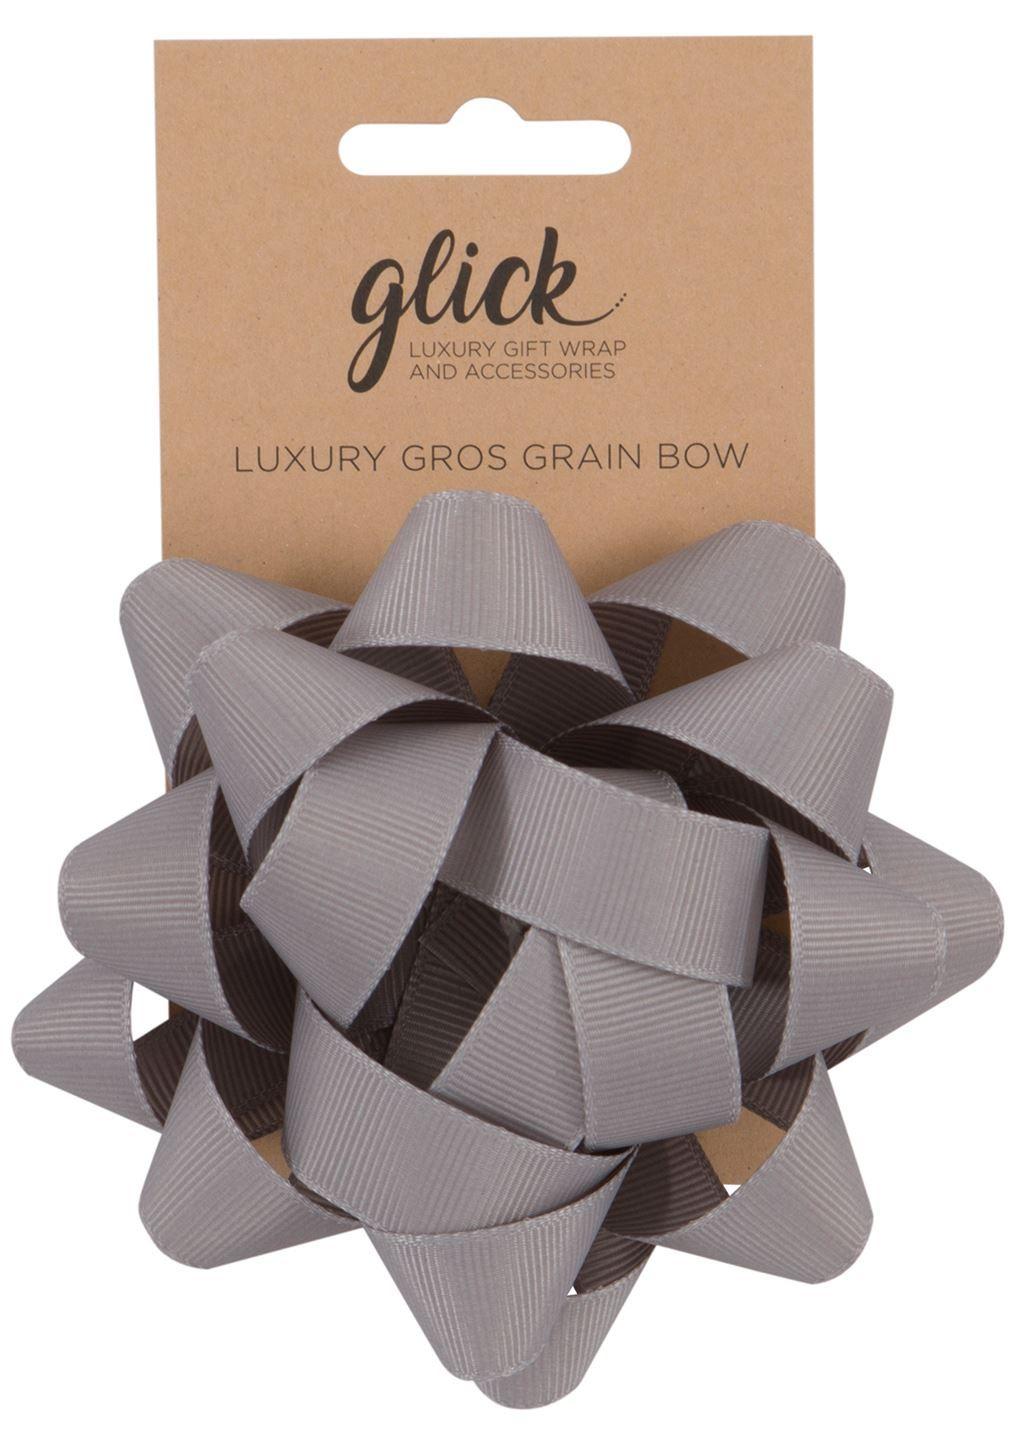 Confetti Bows - SILVER - 12CM Grosgrain CONFETTI BOWS - Luxury GIFT Bow - G